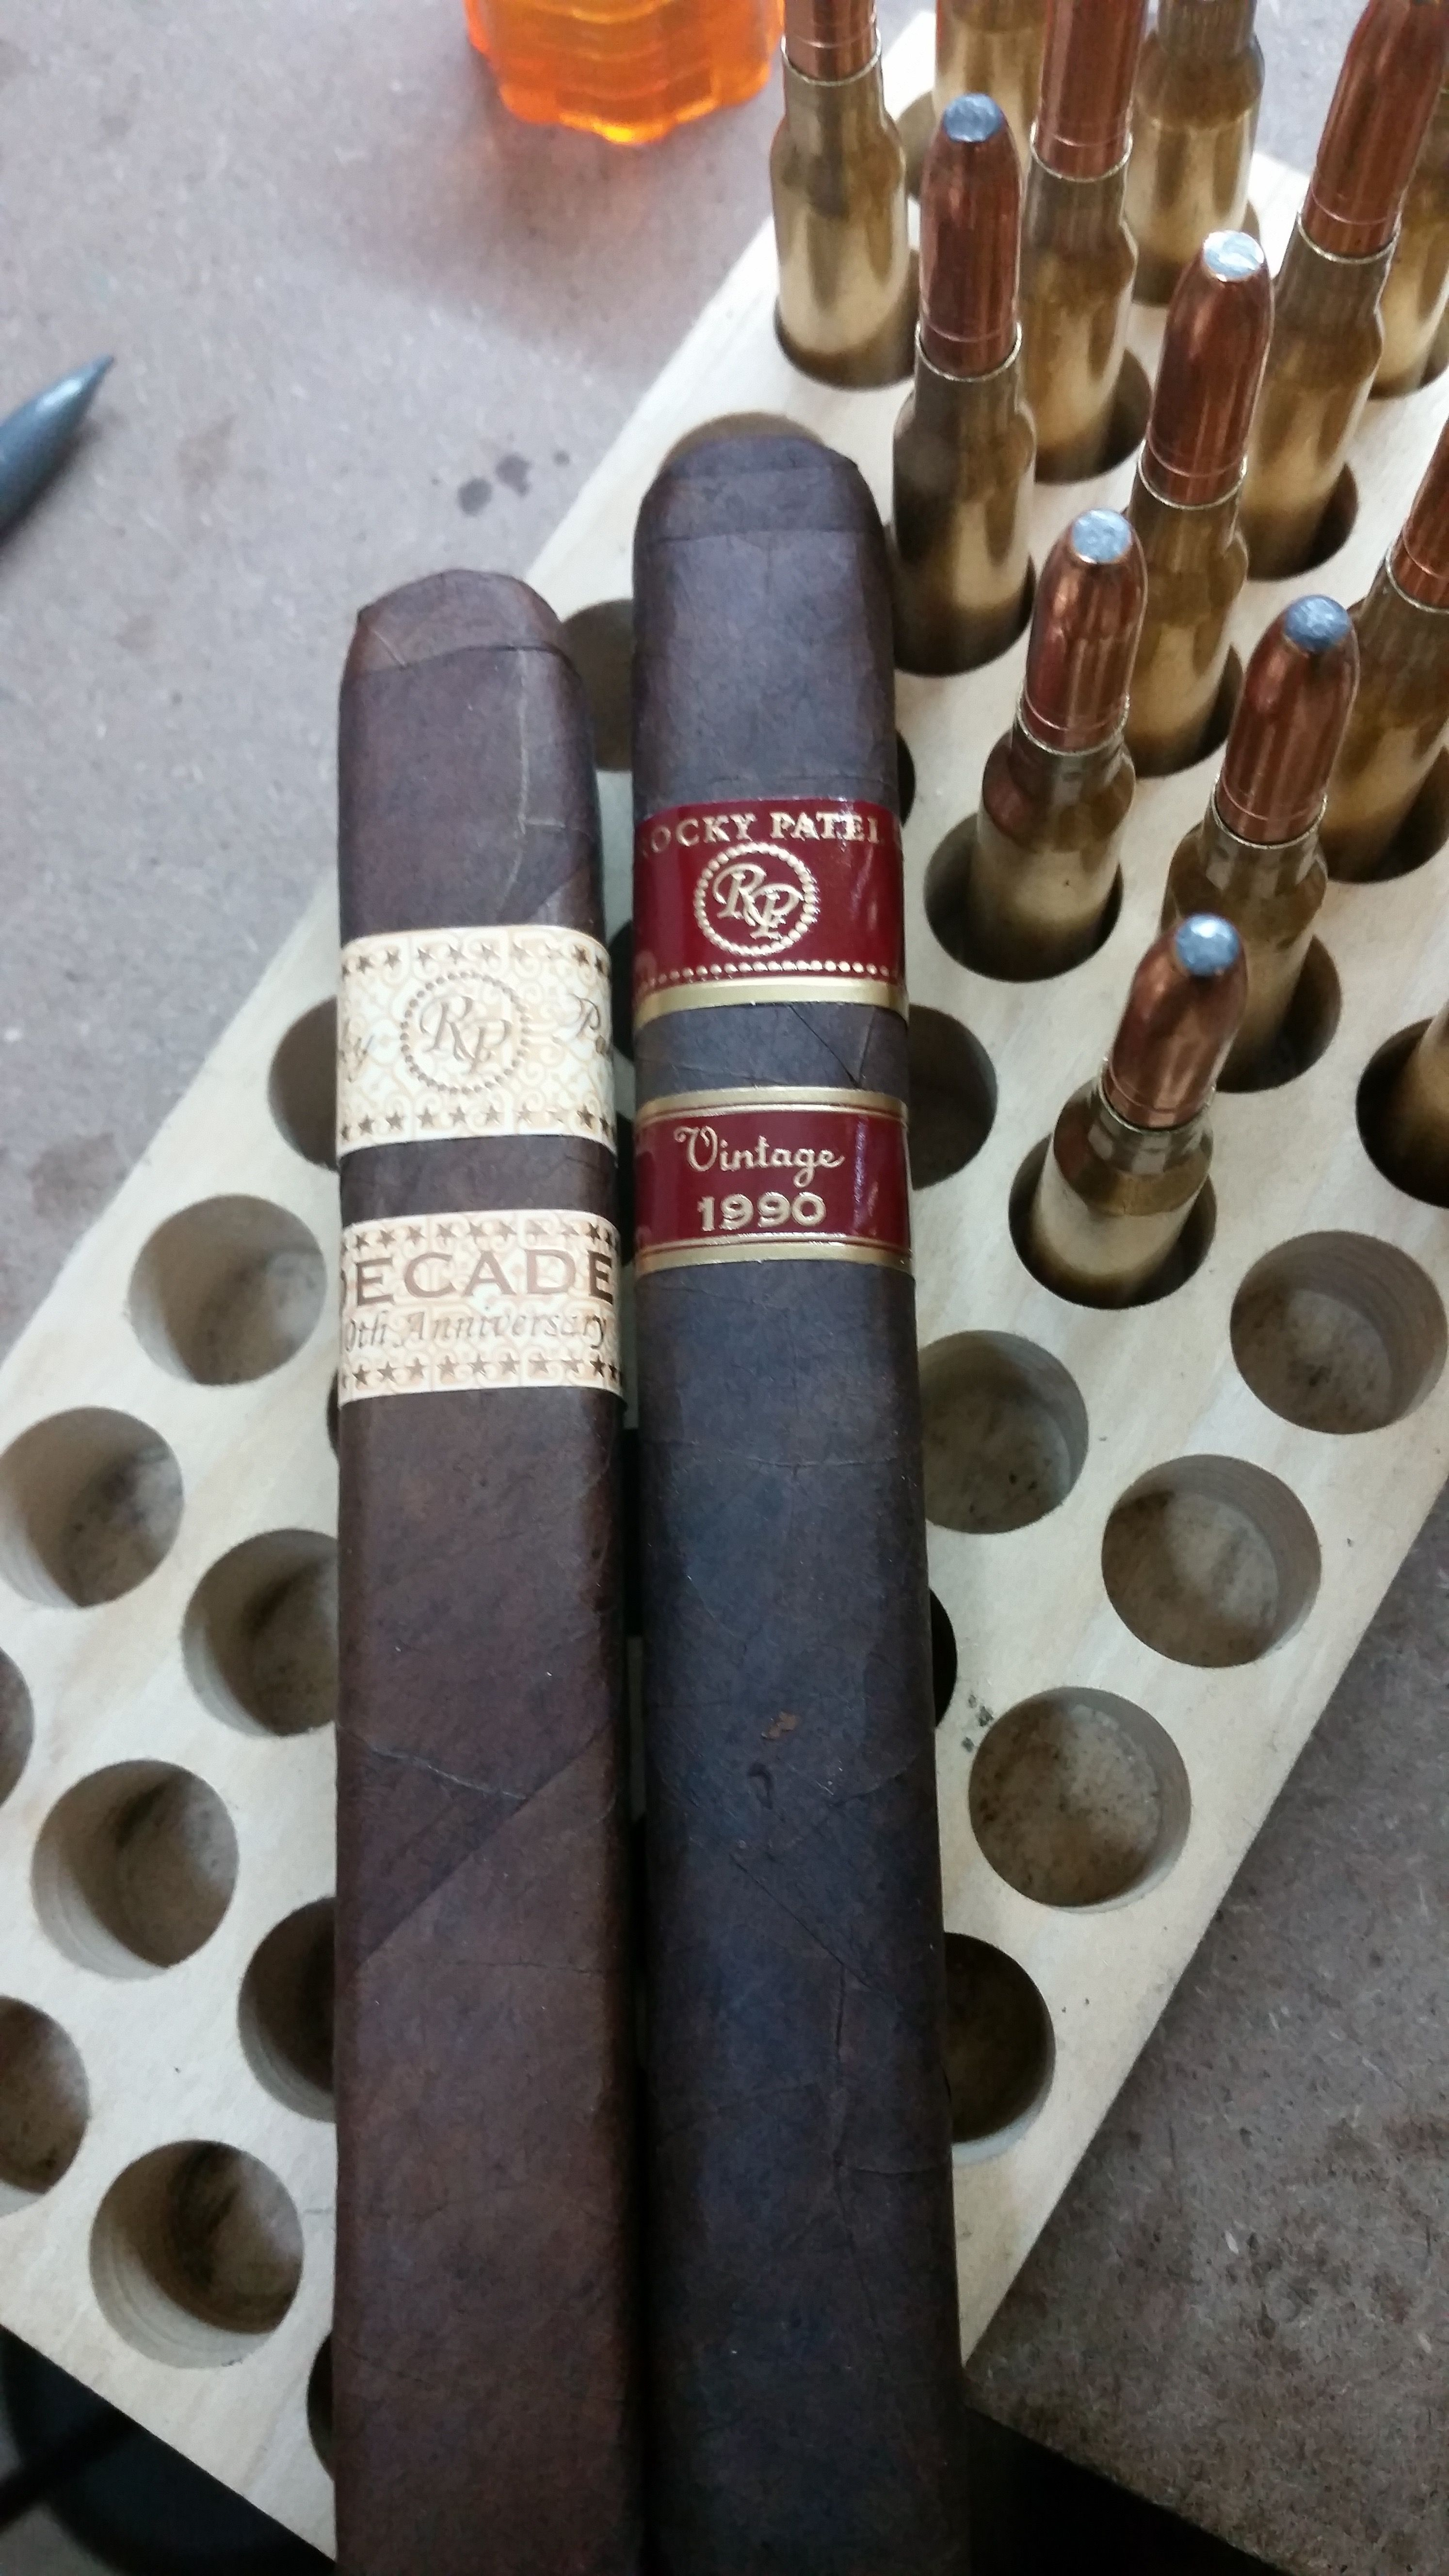 Rocky Patel Decade Cigar